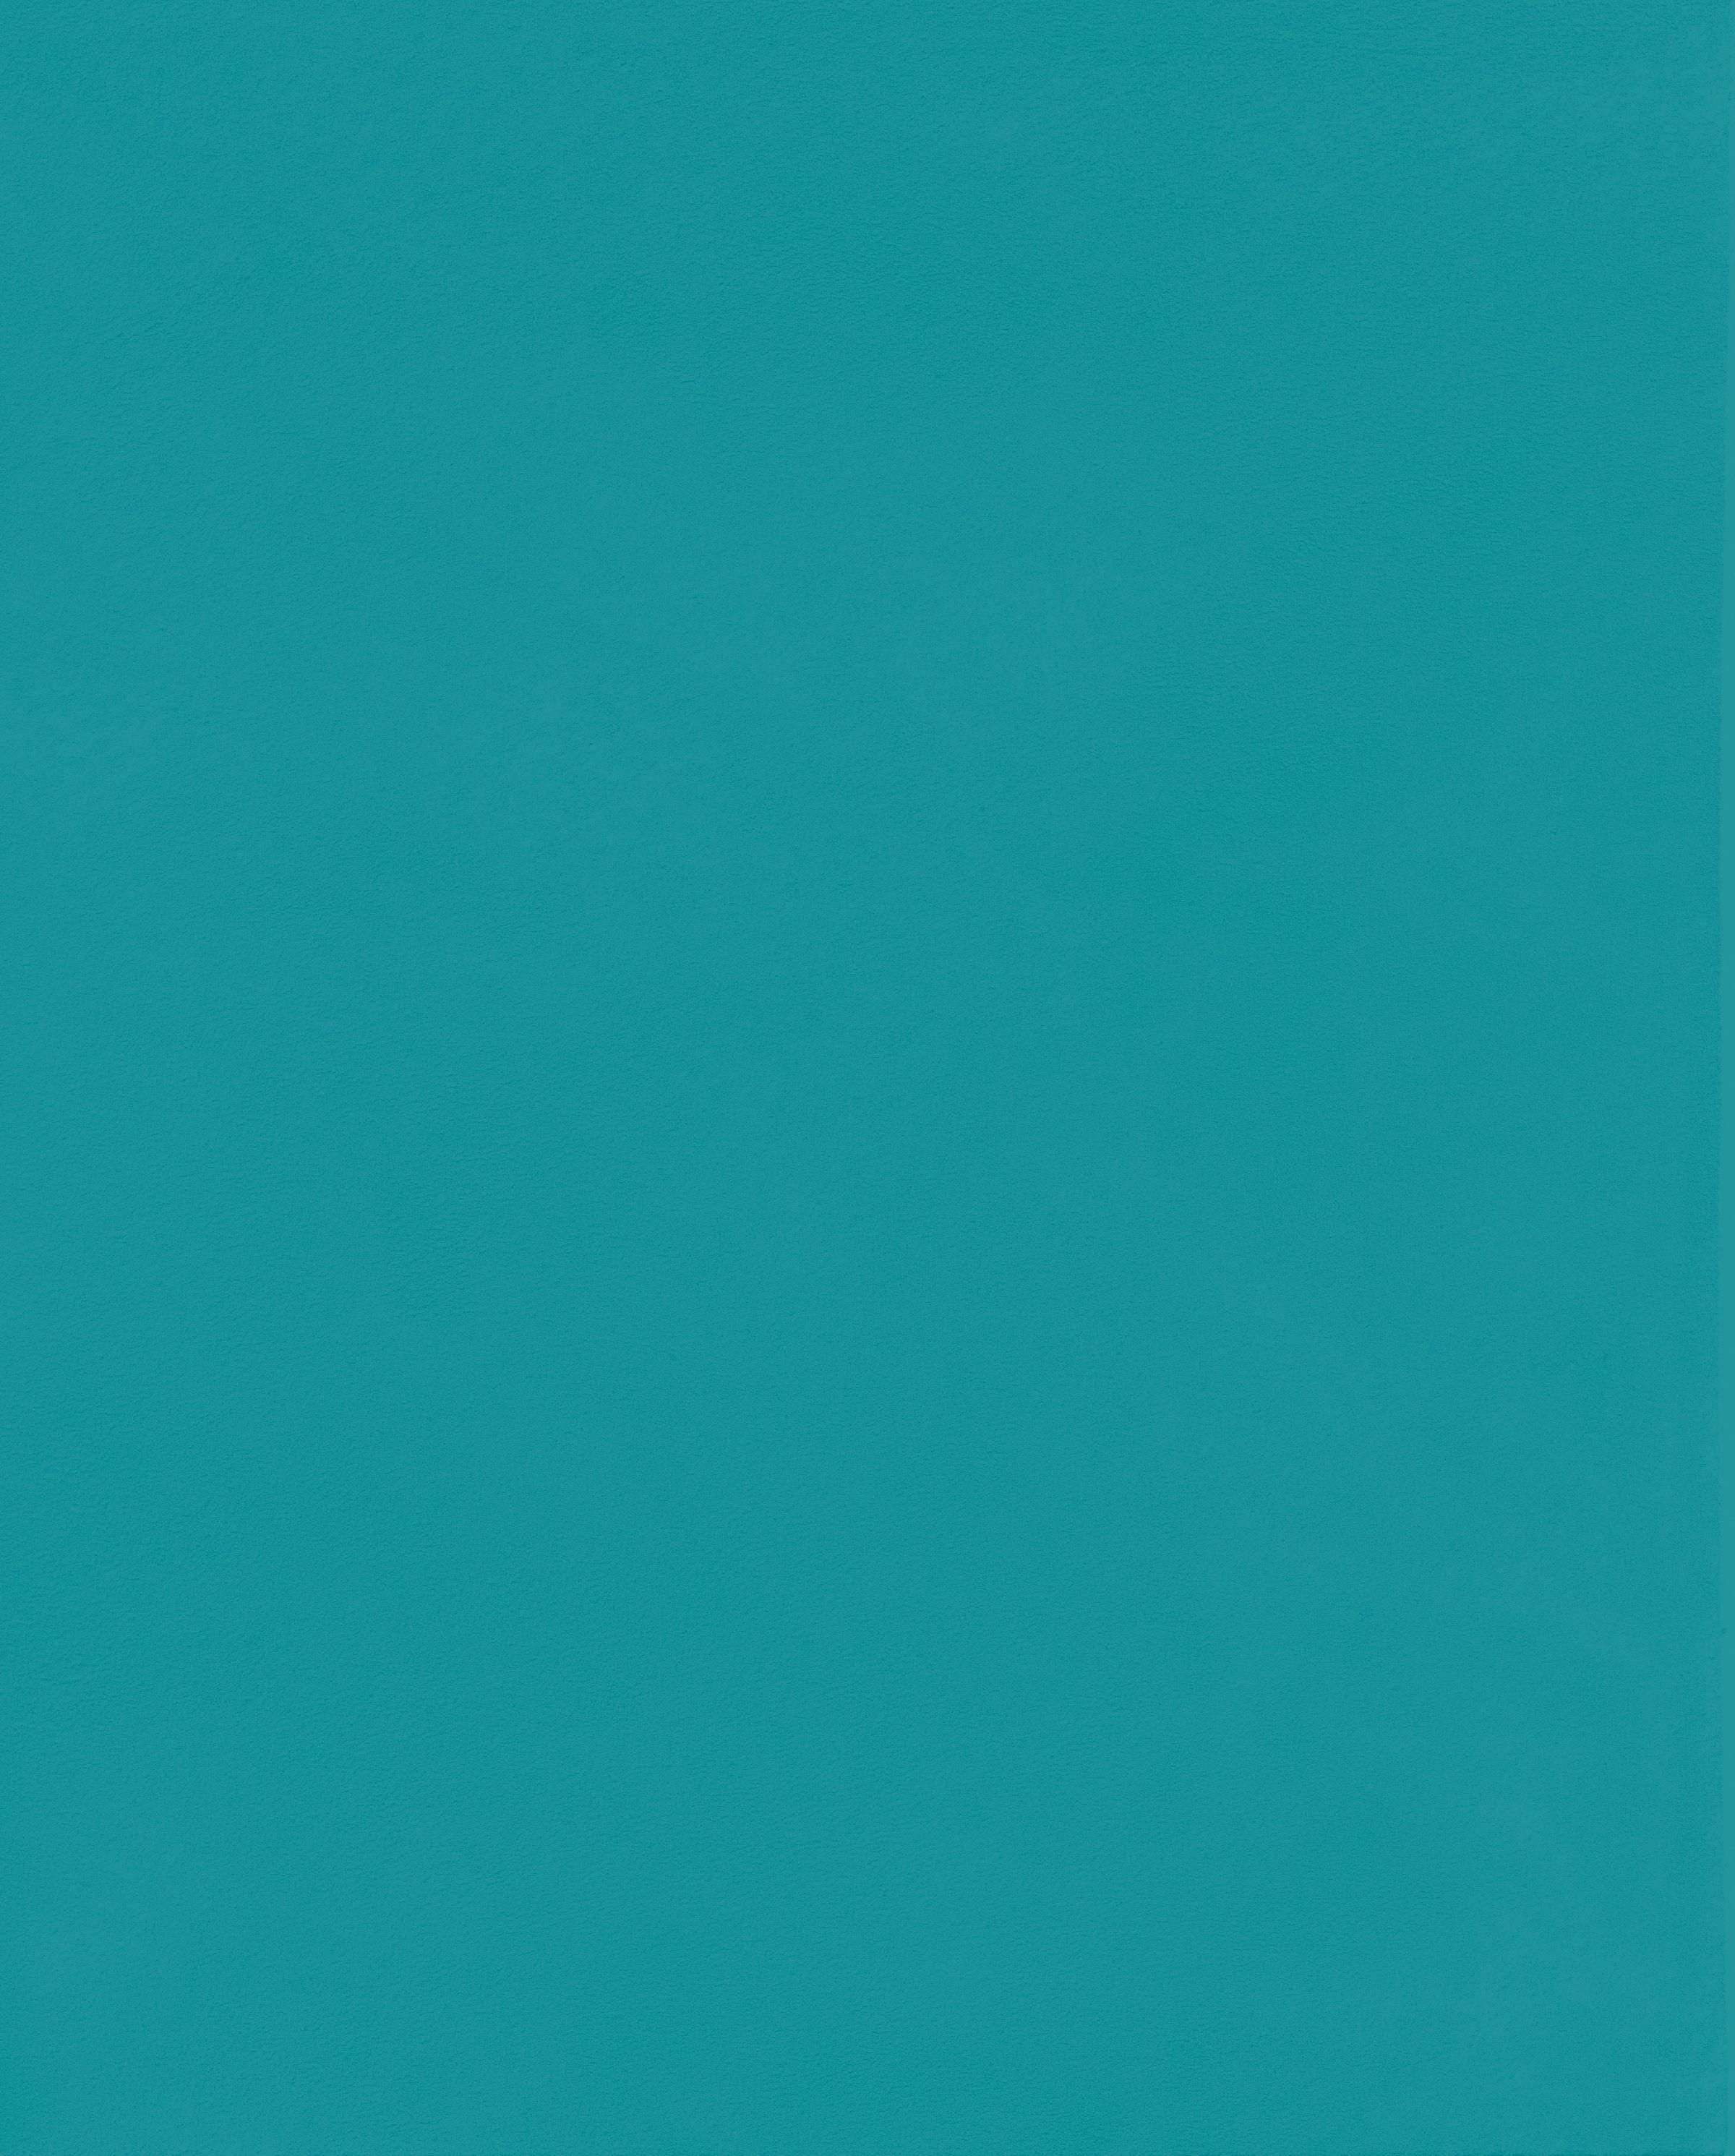 teal blue color swatch | My room | Pinterest | Teal blue ...